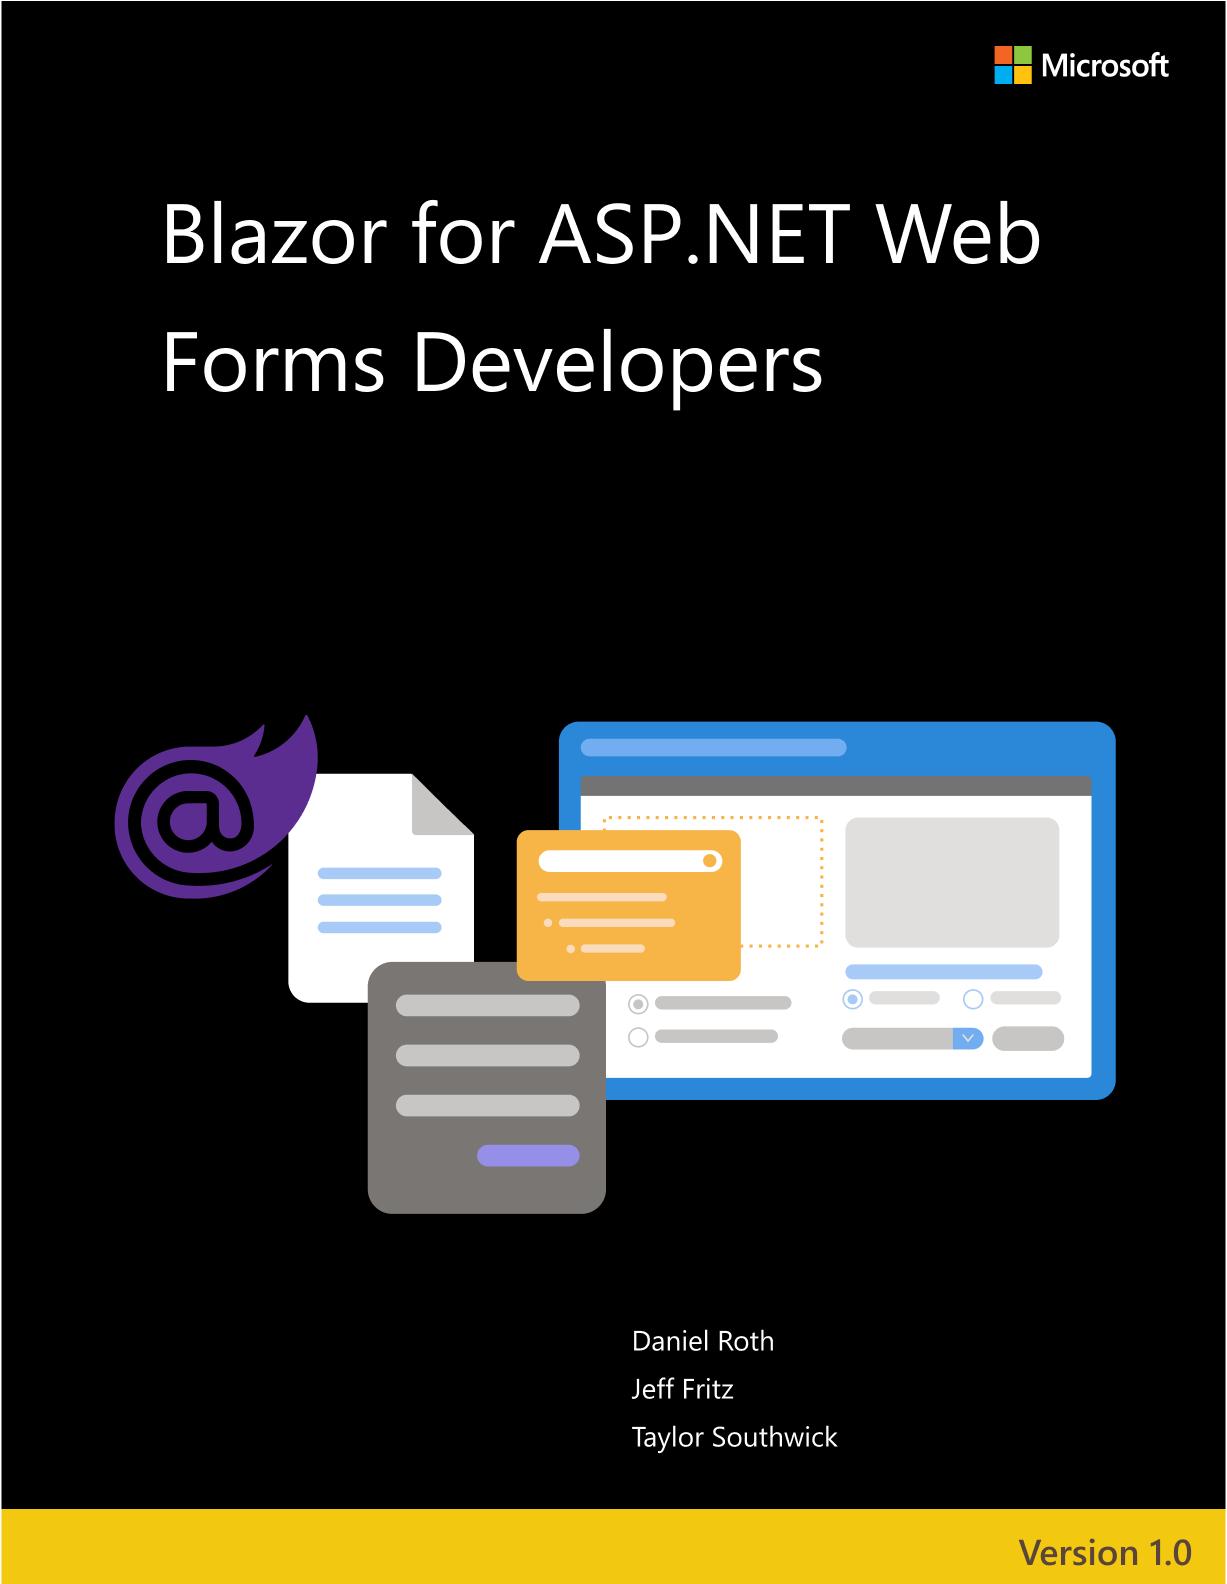 Darmowy ebook Blazor for ASP.NET Web Forms Developers